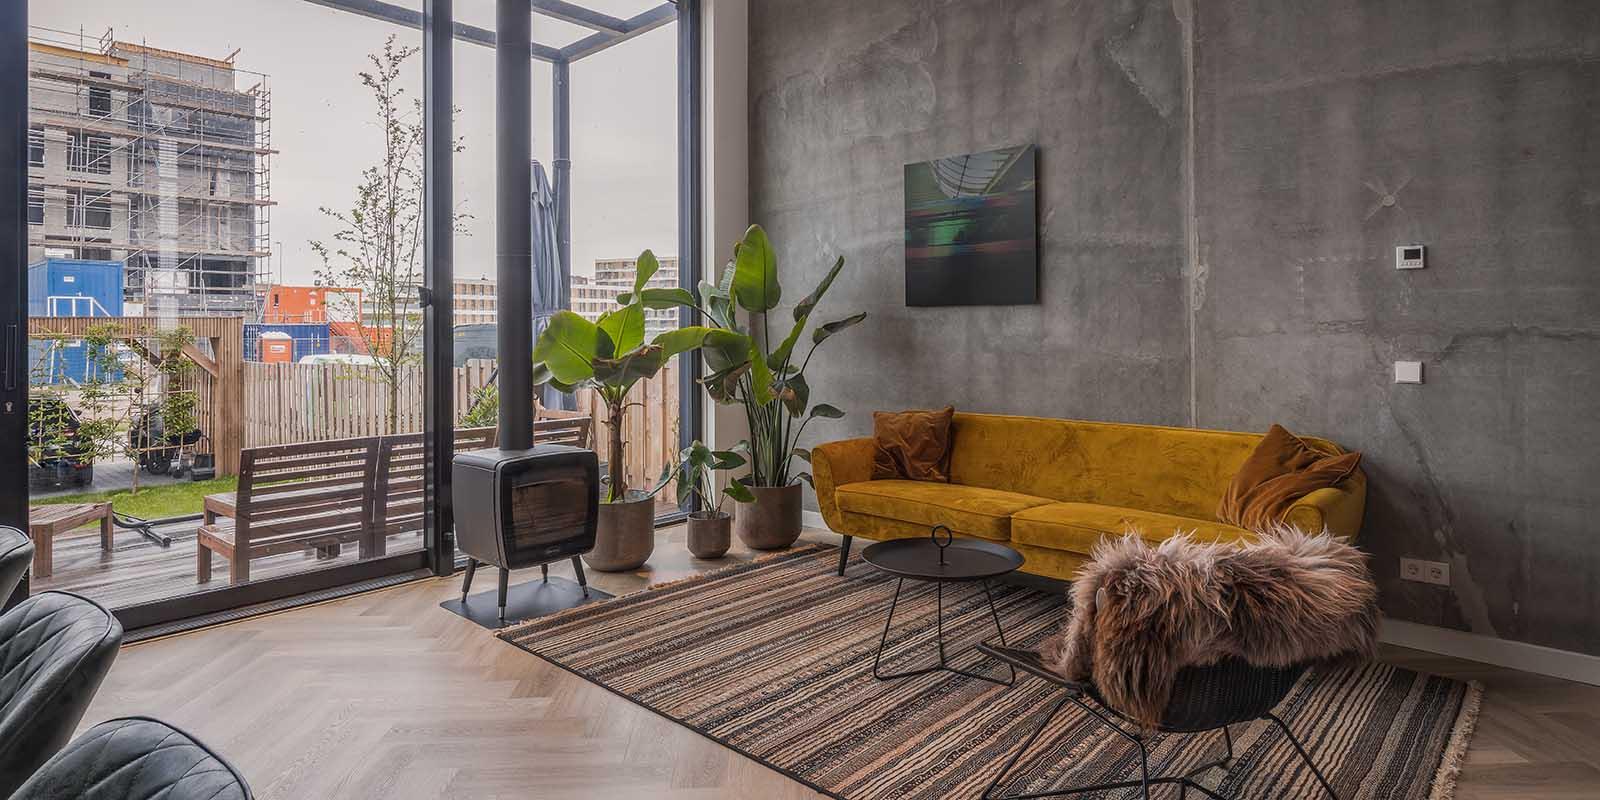 stoer interieur   Otten van Eck, the art of living